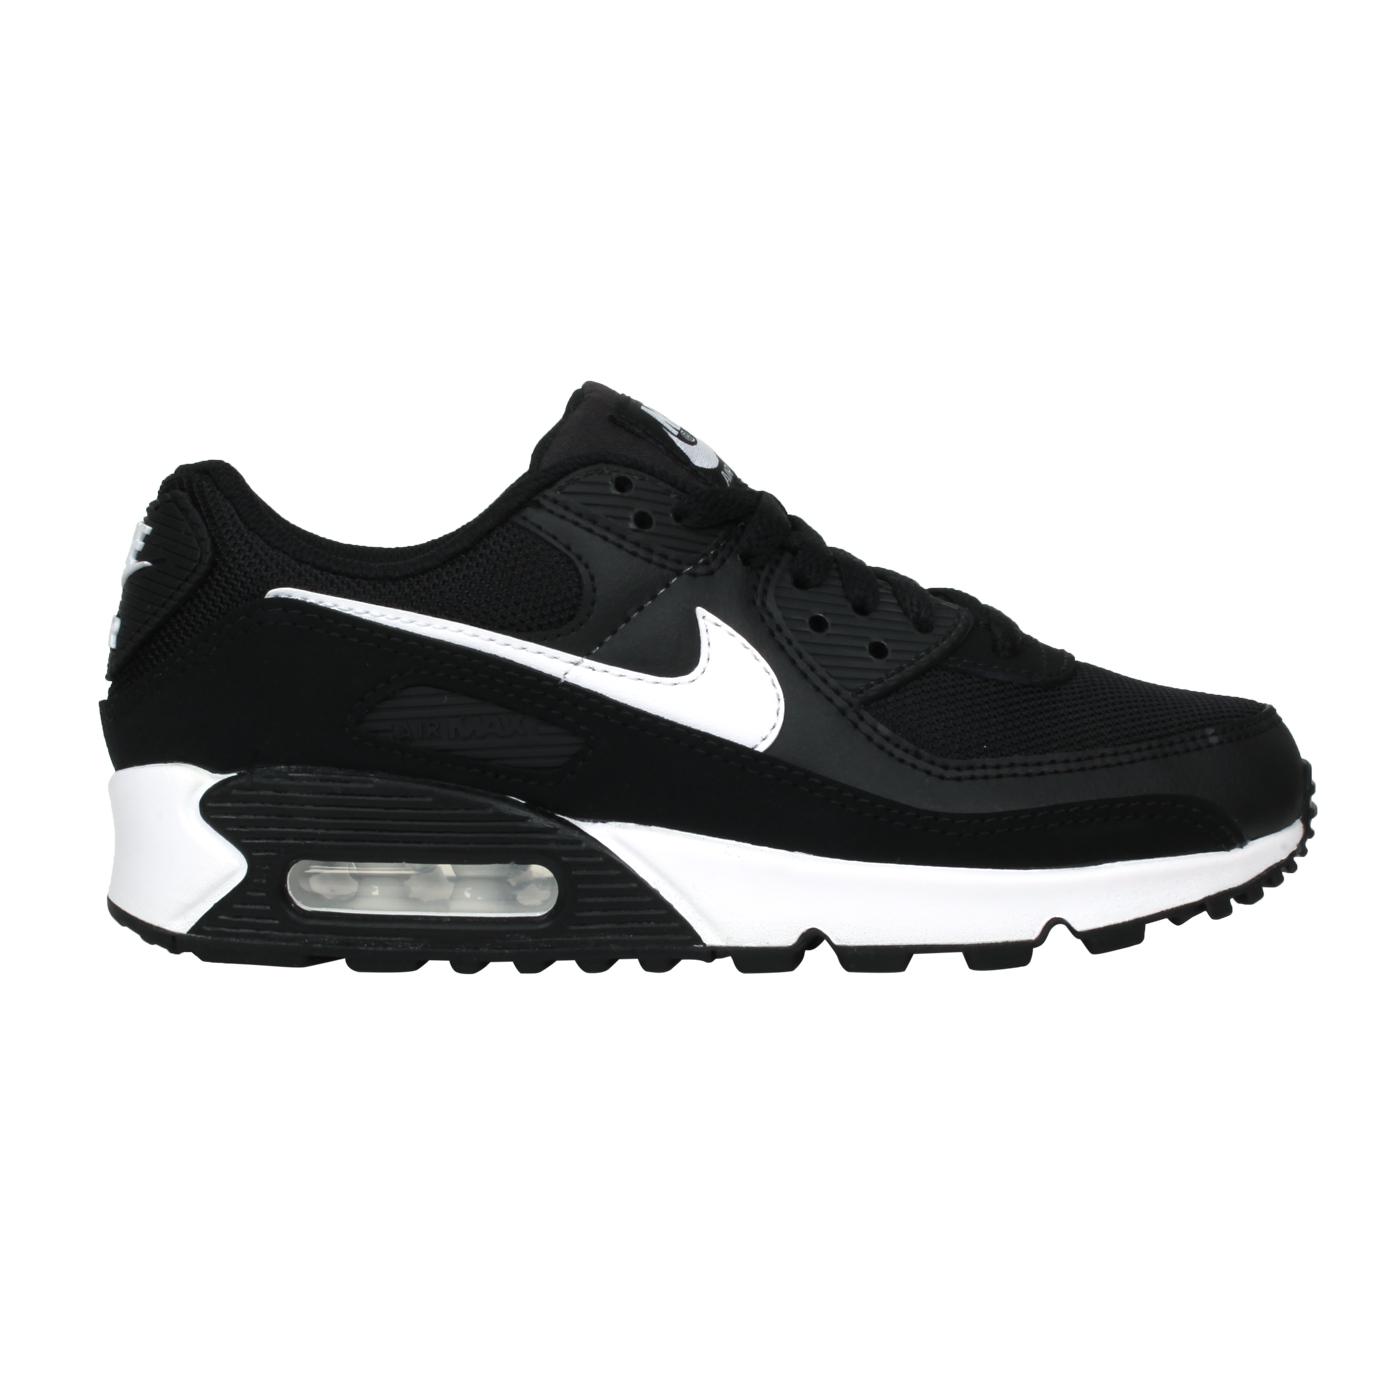 NIKE 女款運動休閒鞋  @W AIR MAX 90@CQ2560001 - 黑白